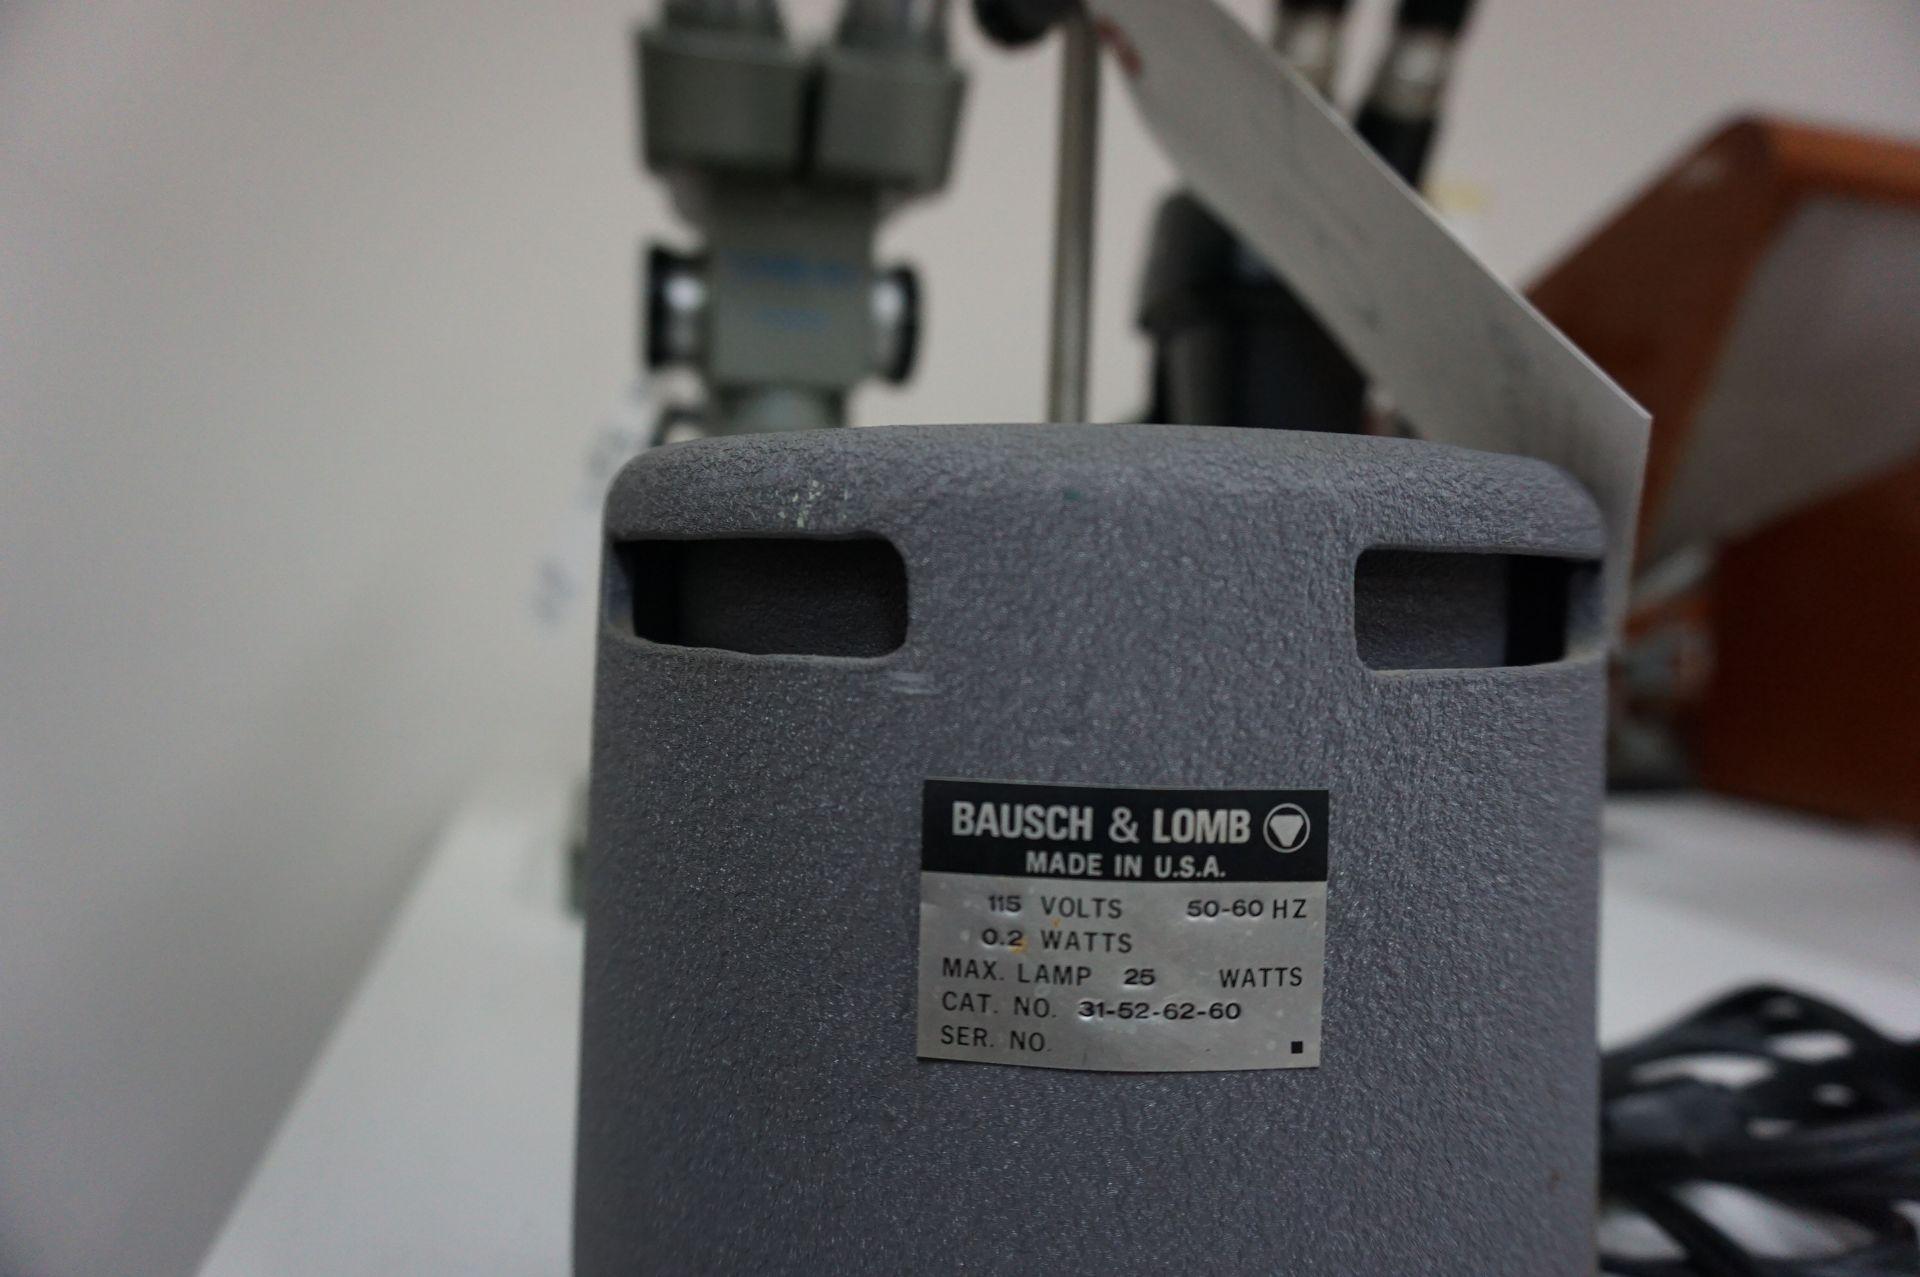 Lot 46 - BAUSCH & LOMB OPTICAL LAMP, CAT NUMBER 31-52-62-60